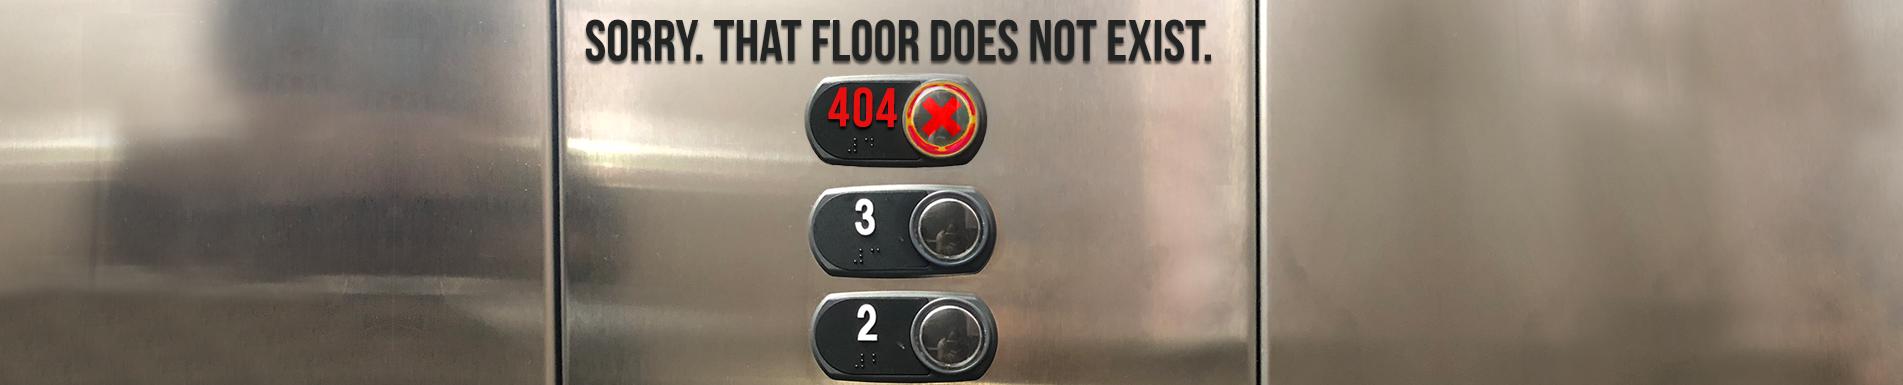 Hotel_elevator_404